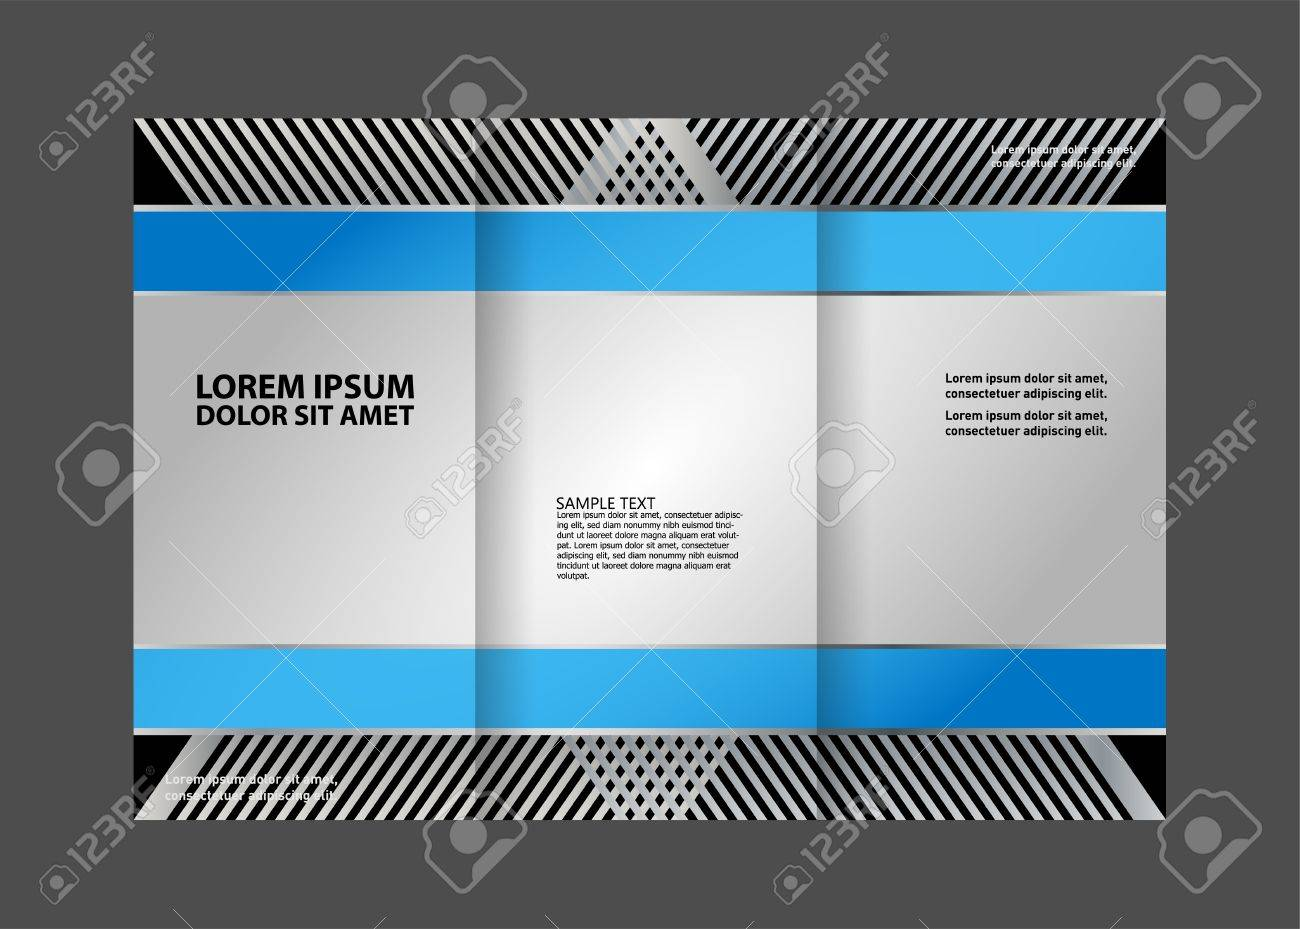 Tri Fold Brochure Empty Vector Print Design Template, Tri Fold Booklet Or  Flyer